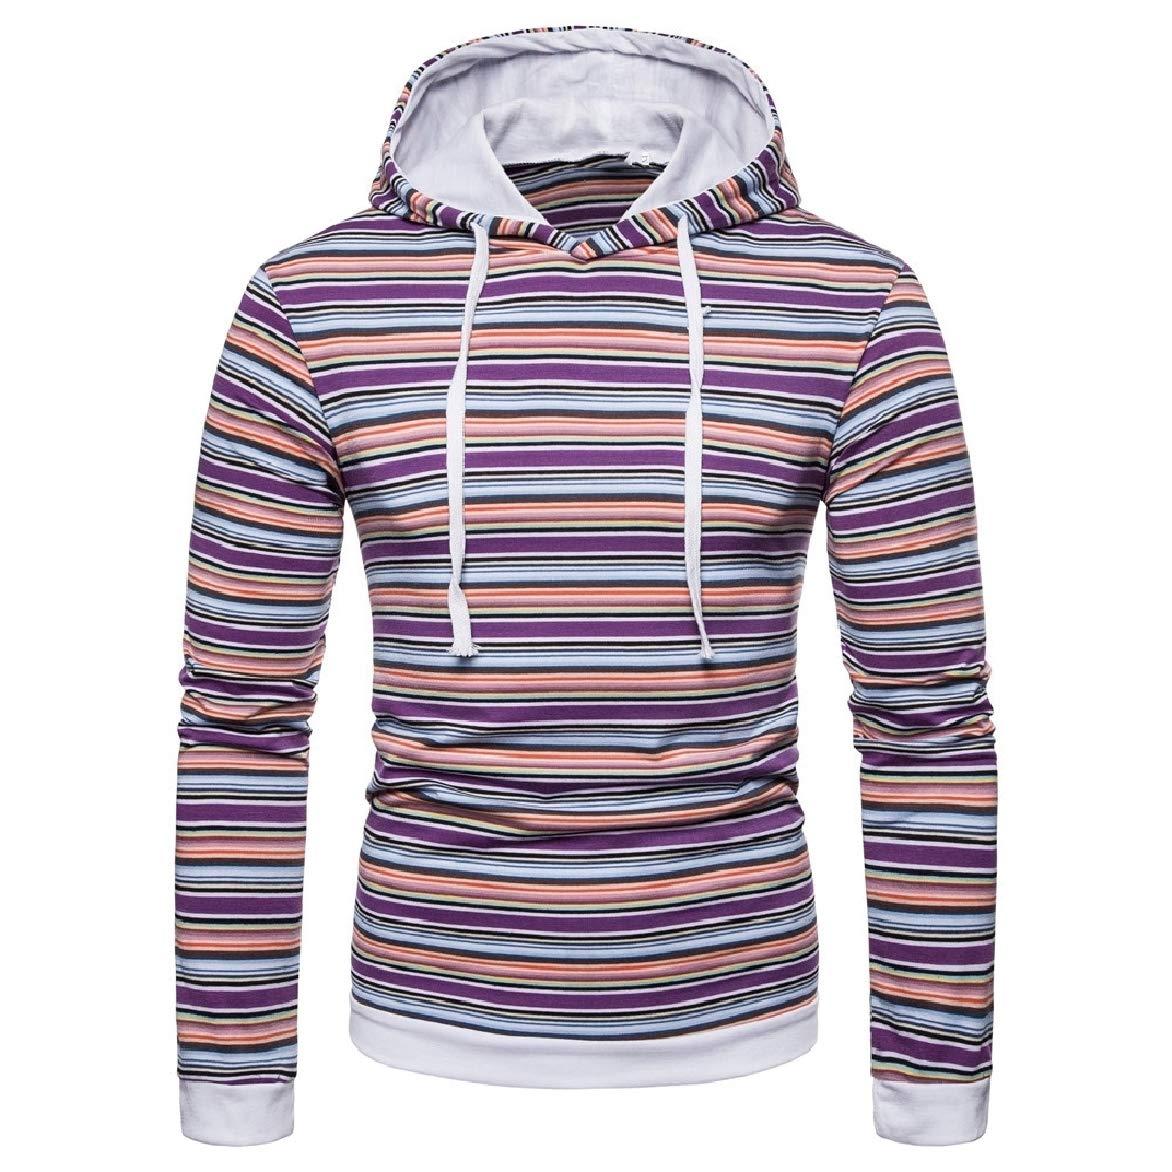 Abetteric Men Hood Stripes Printed Plus Size Pullover Outwear Sweatshirt